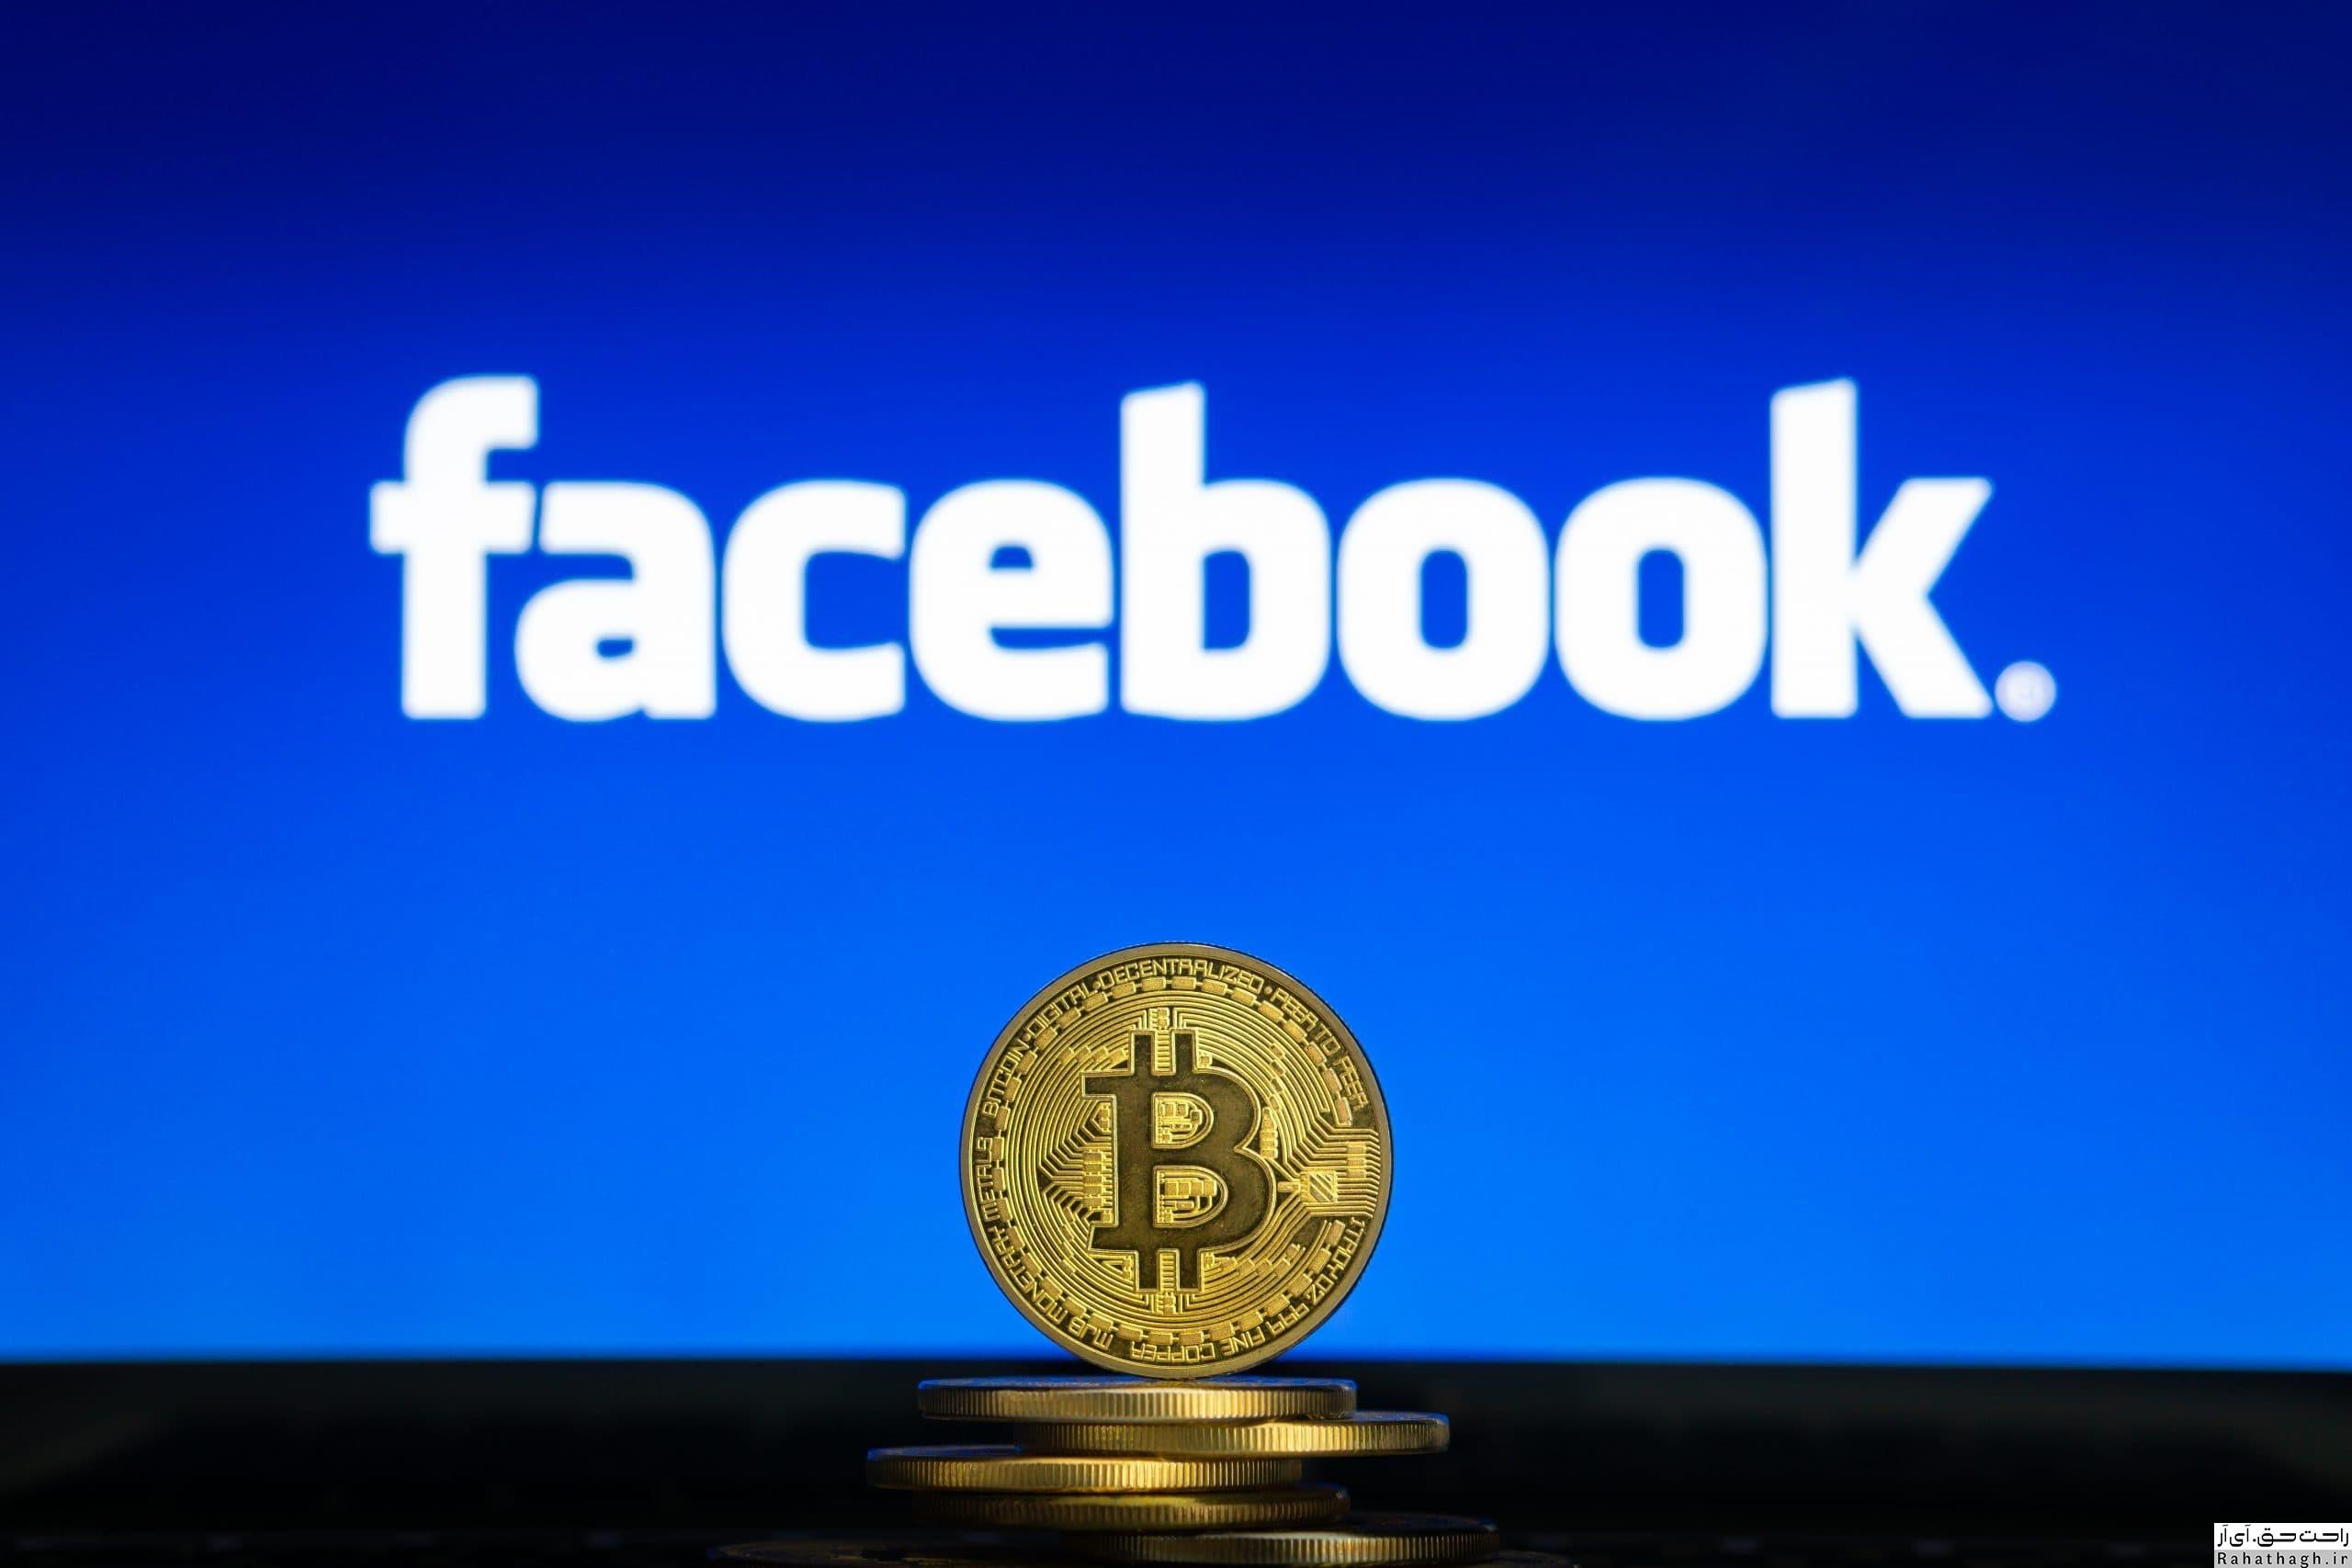 https://s18.picofile.com/file/8433340550/Facebook_Bitcoin_%D8%B1%D8%A7%D8%AD%D8%AA_%D8%AD%D9%82.jpg